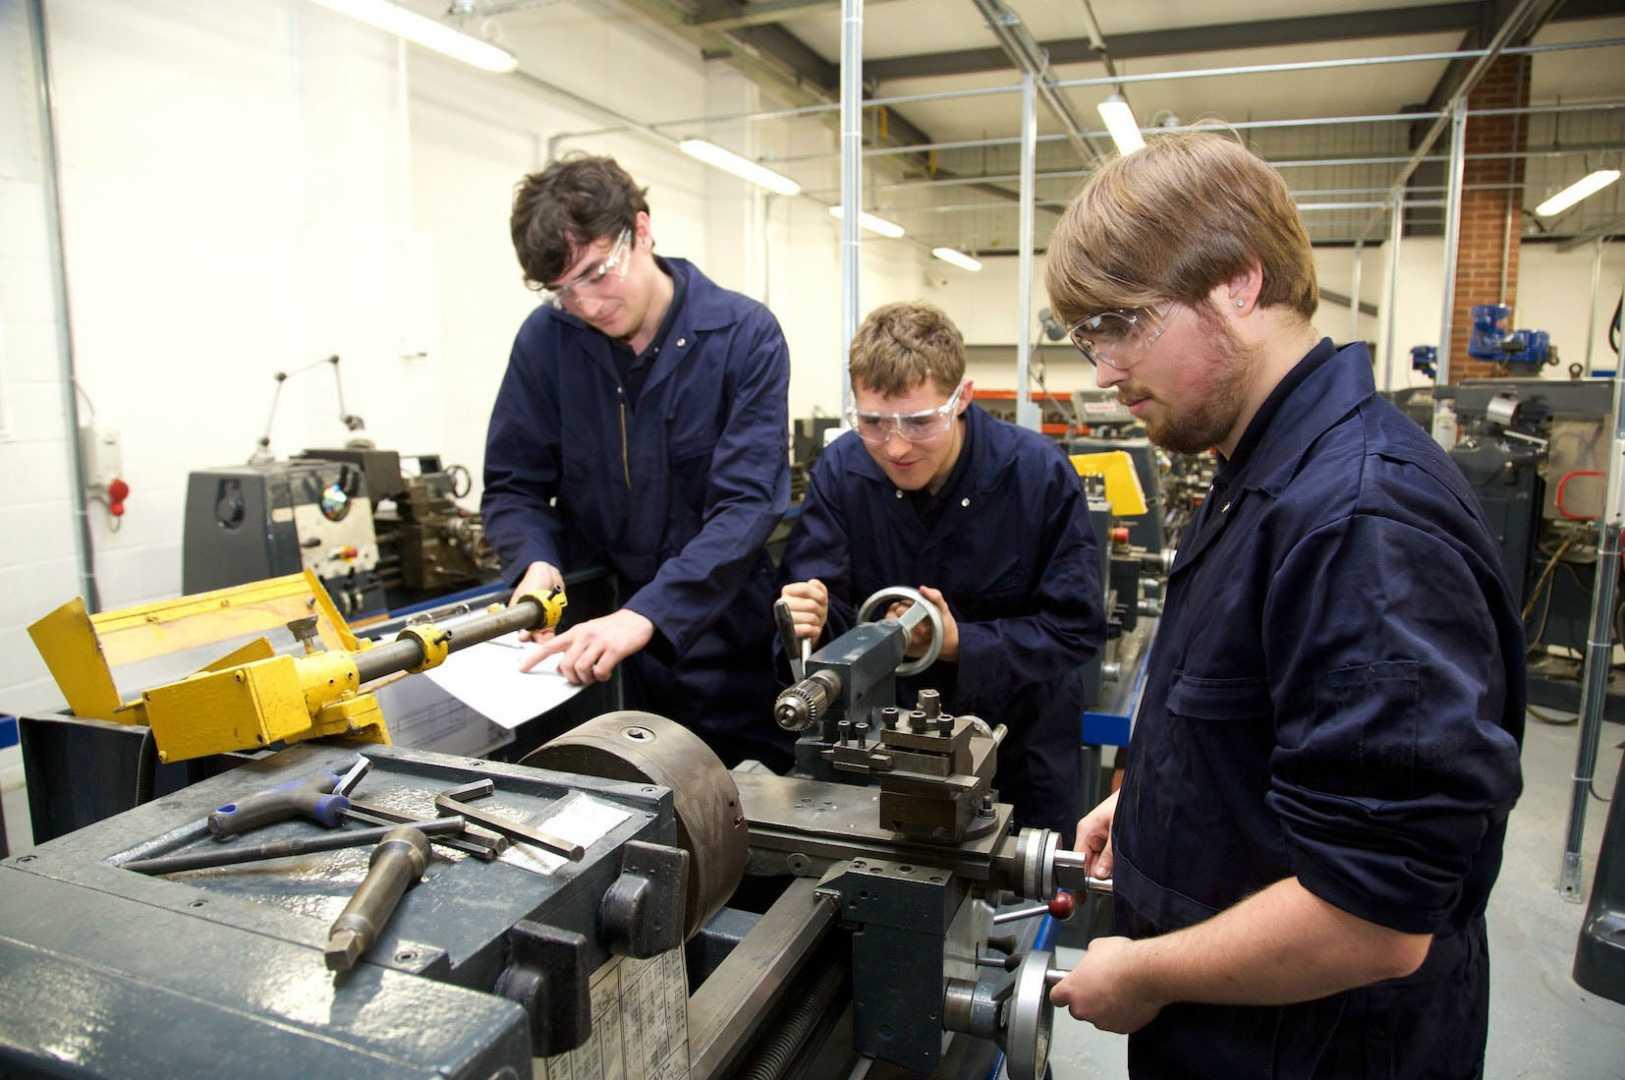 (L to R) Alex, Malam, Connor Macrae and Alex Owen (all apprentices at Salop Design & Engineering).